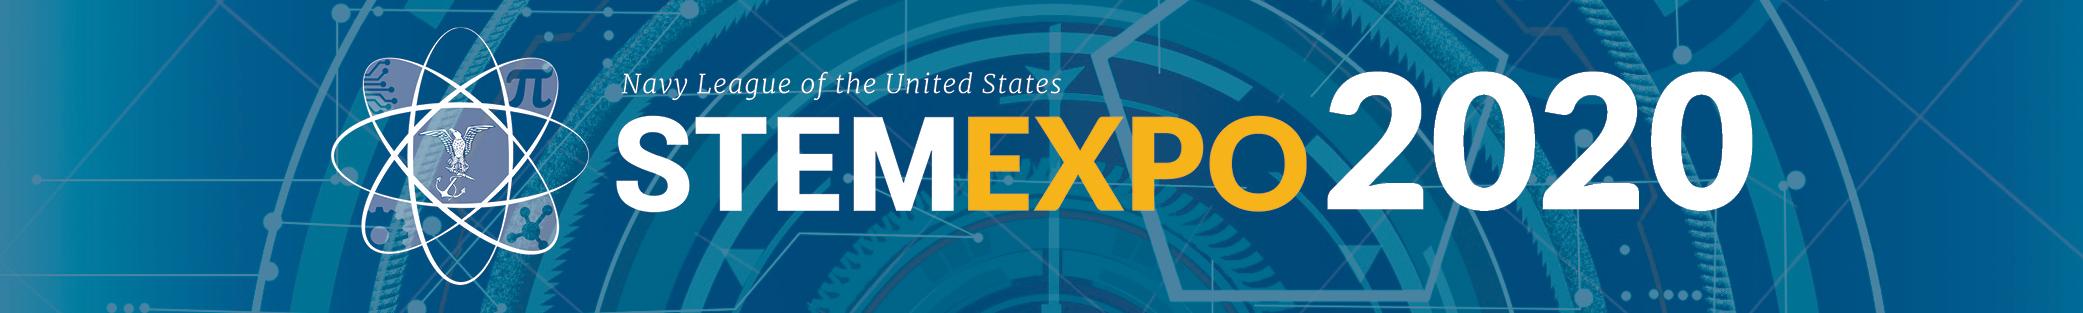 Stem Expo 2020